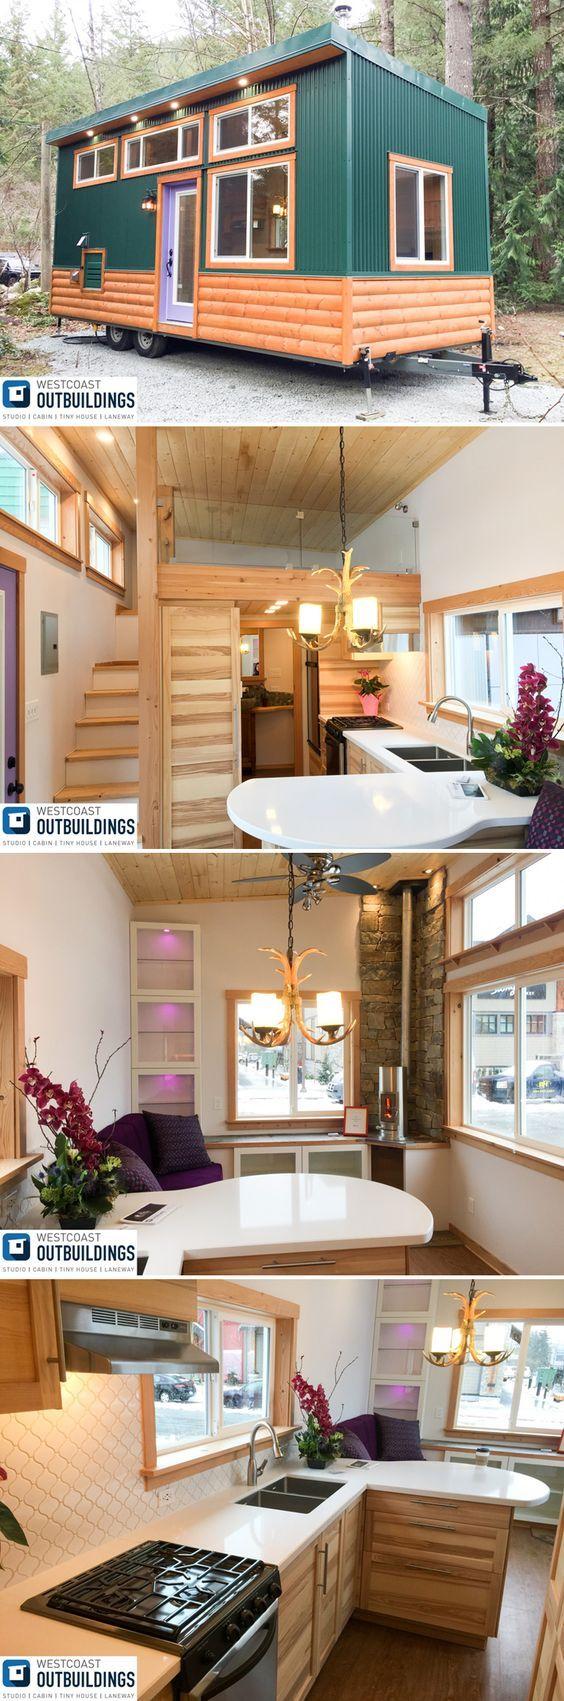 Skookum by Westcoast Outbuildings Tiny Living